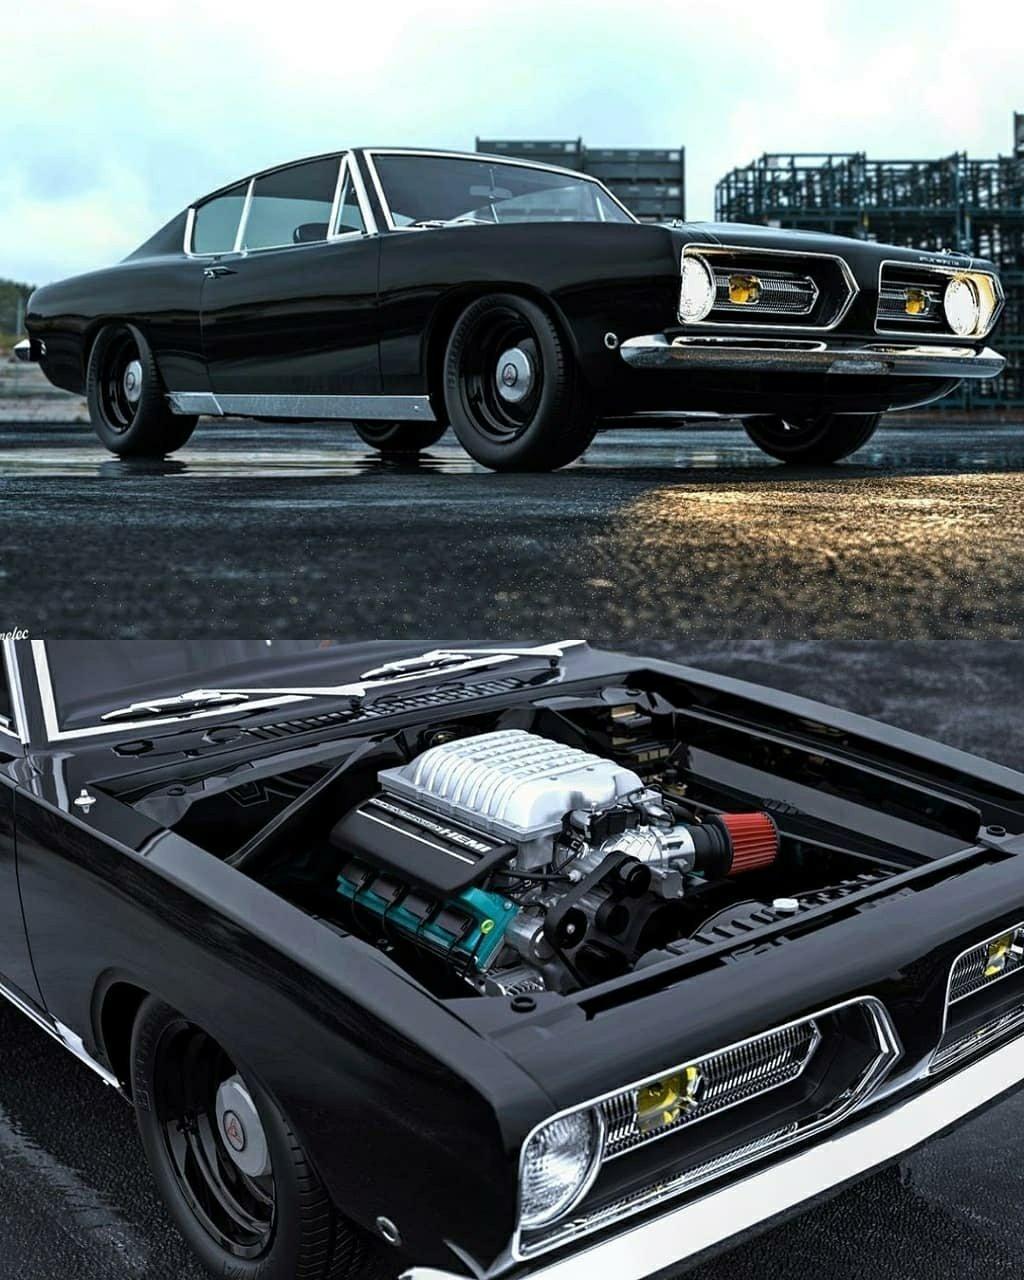 68 Plymouth Barracuda